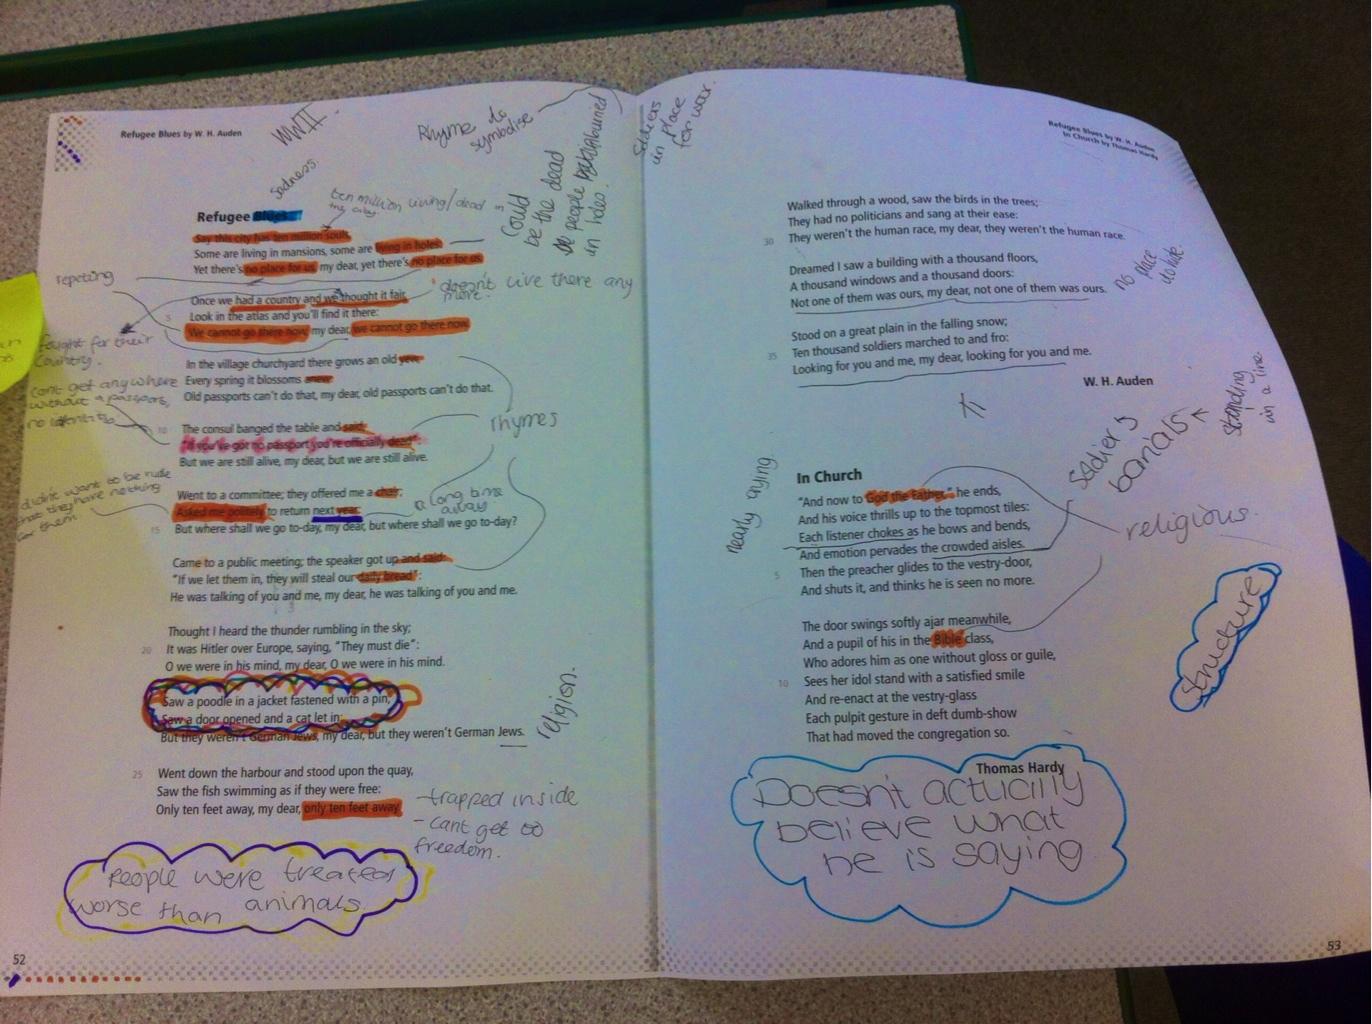 refugee blues analysis essay